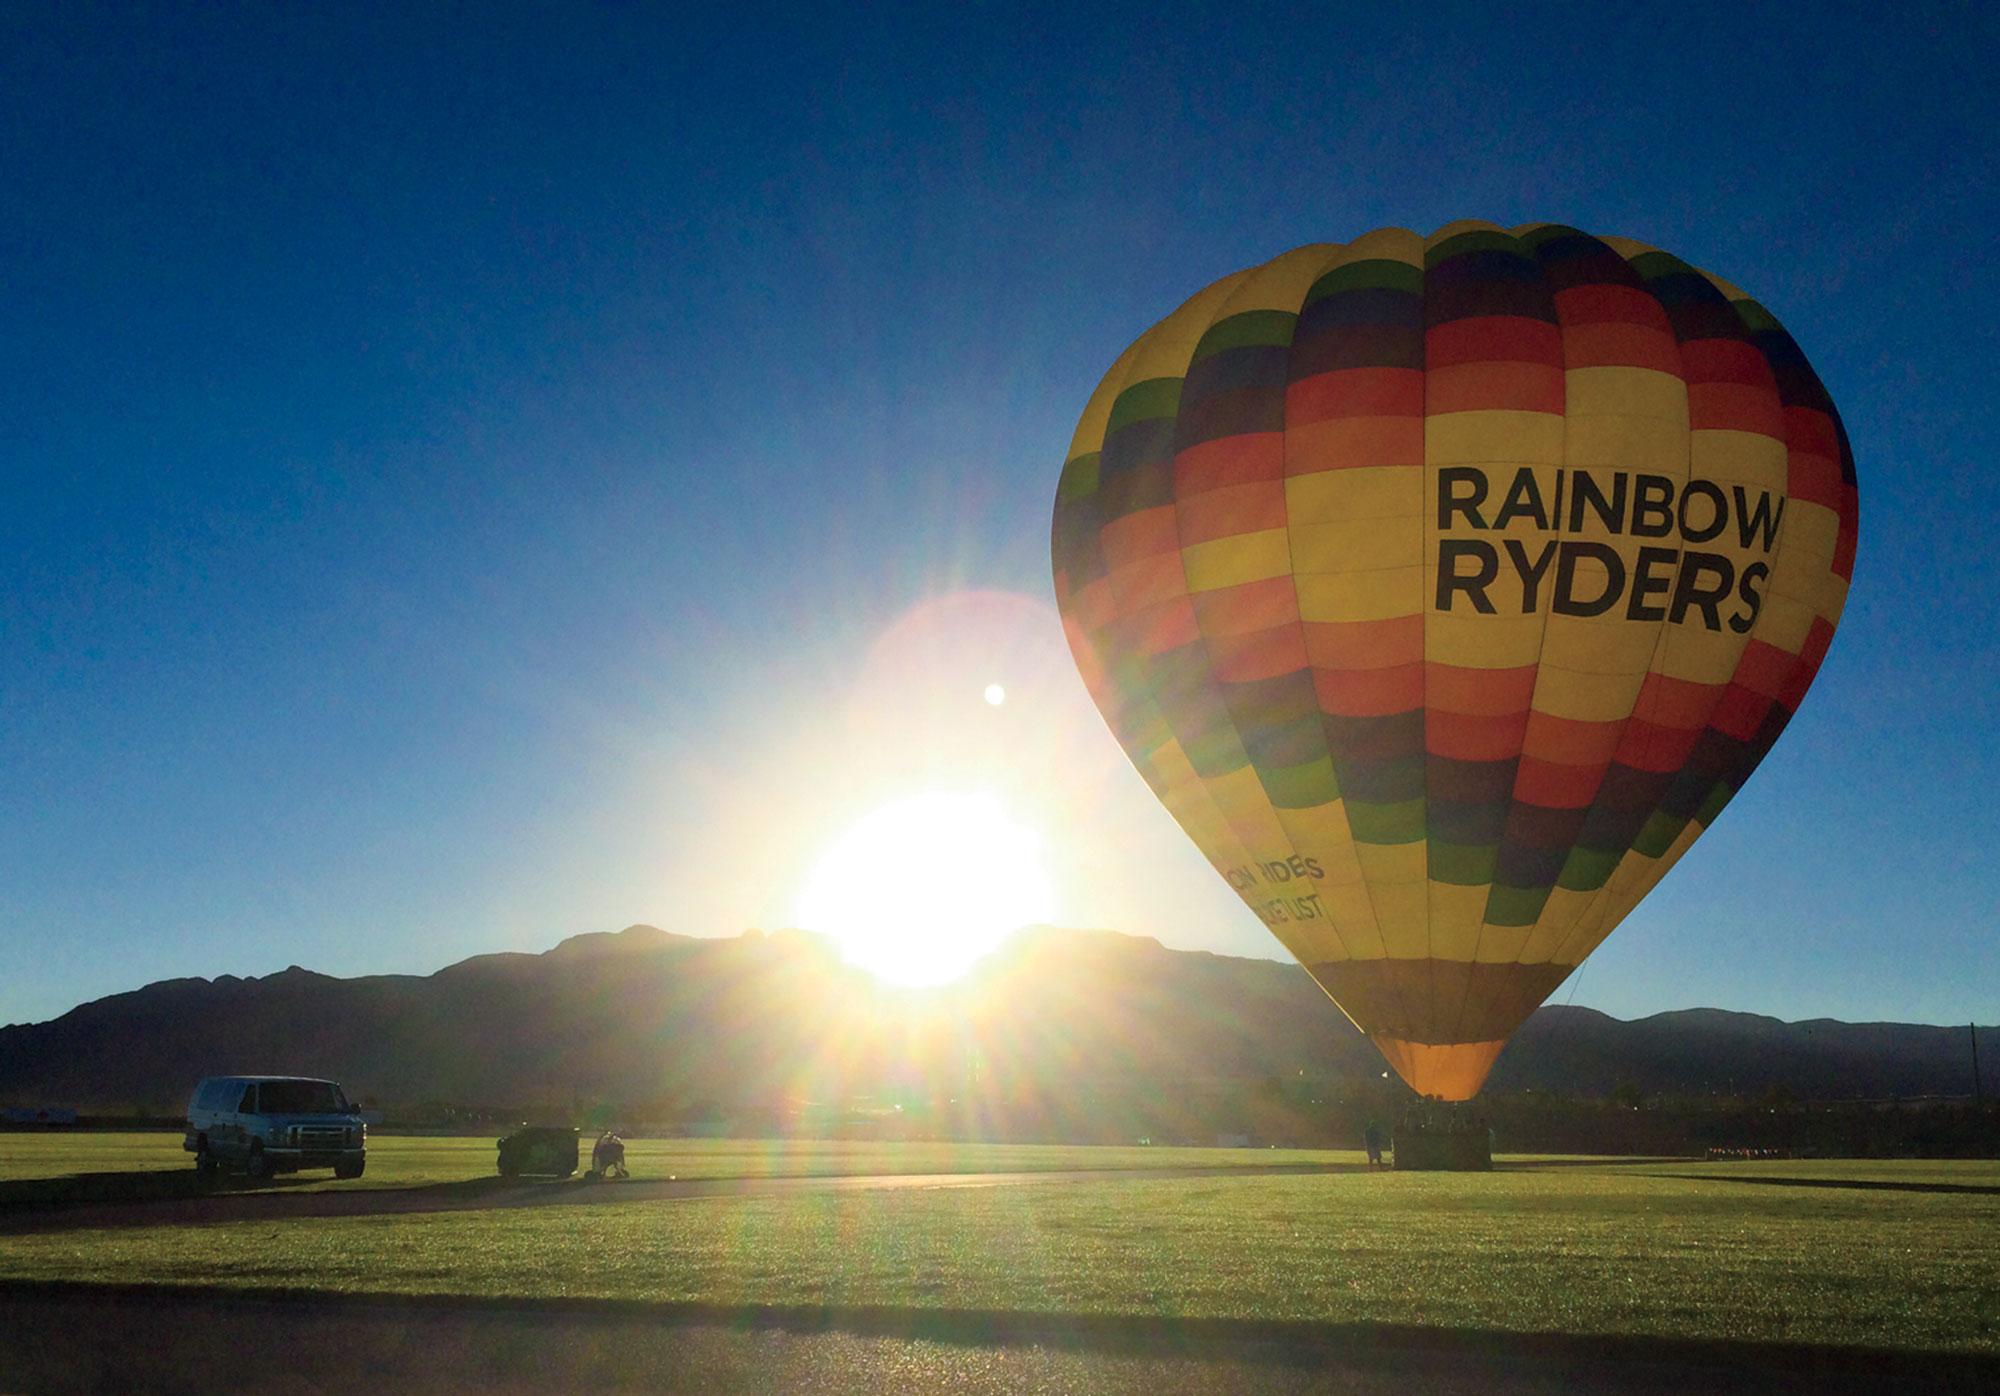 Photo courtesy Rainbow Ryders